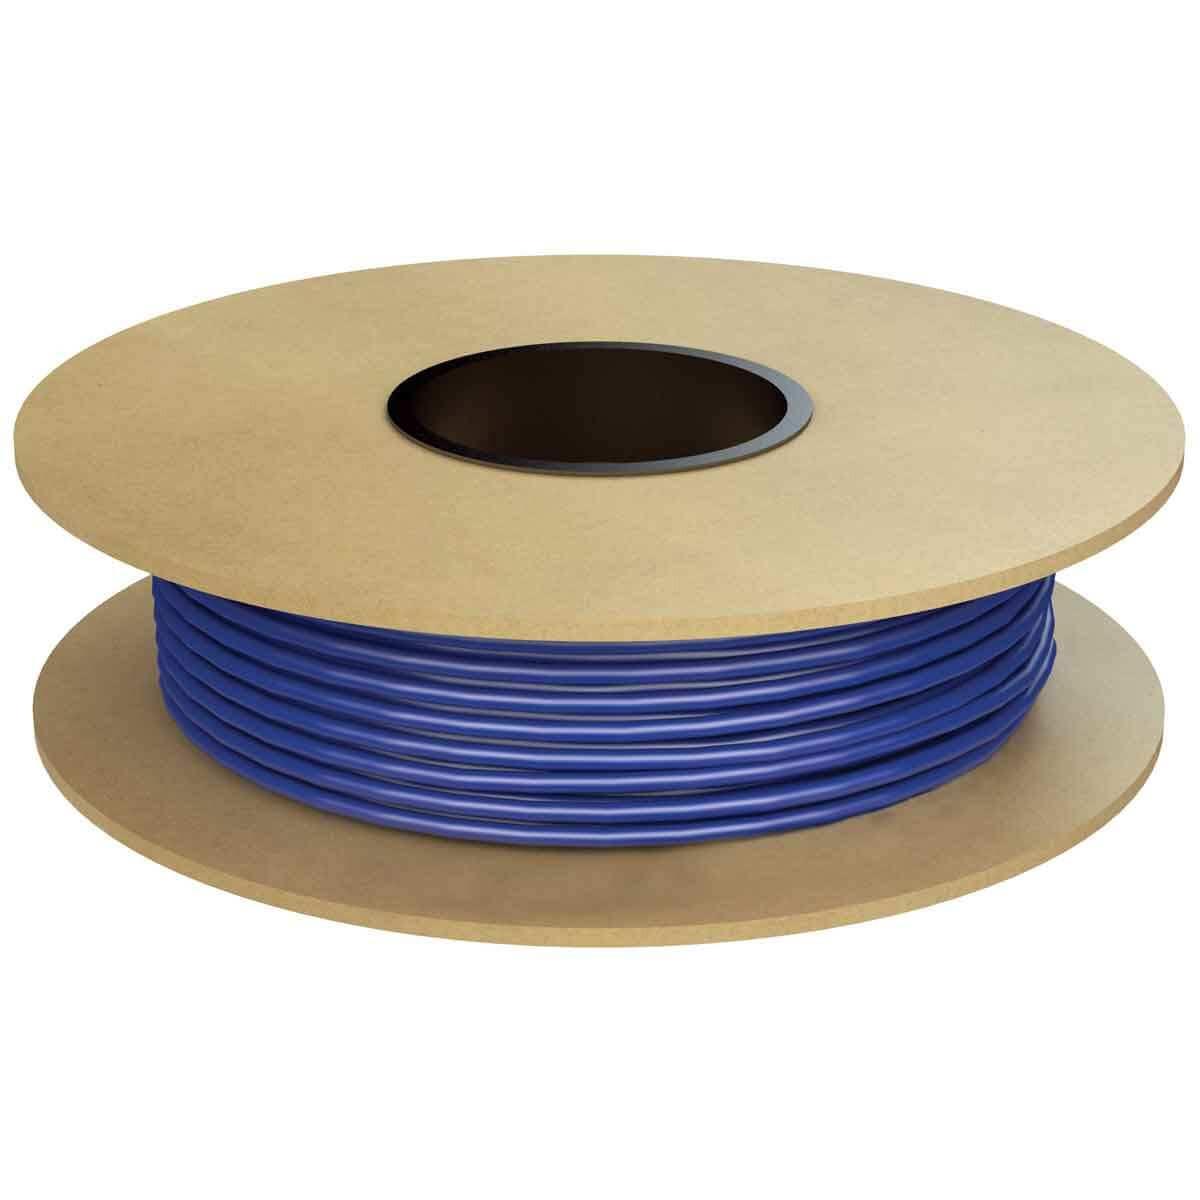 Laticrete Strata Heat Floor Heating